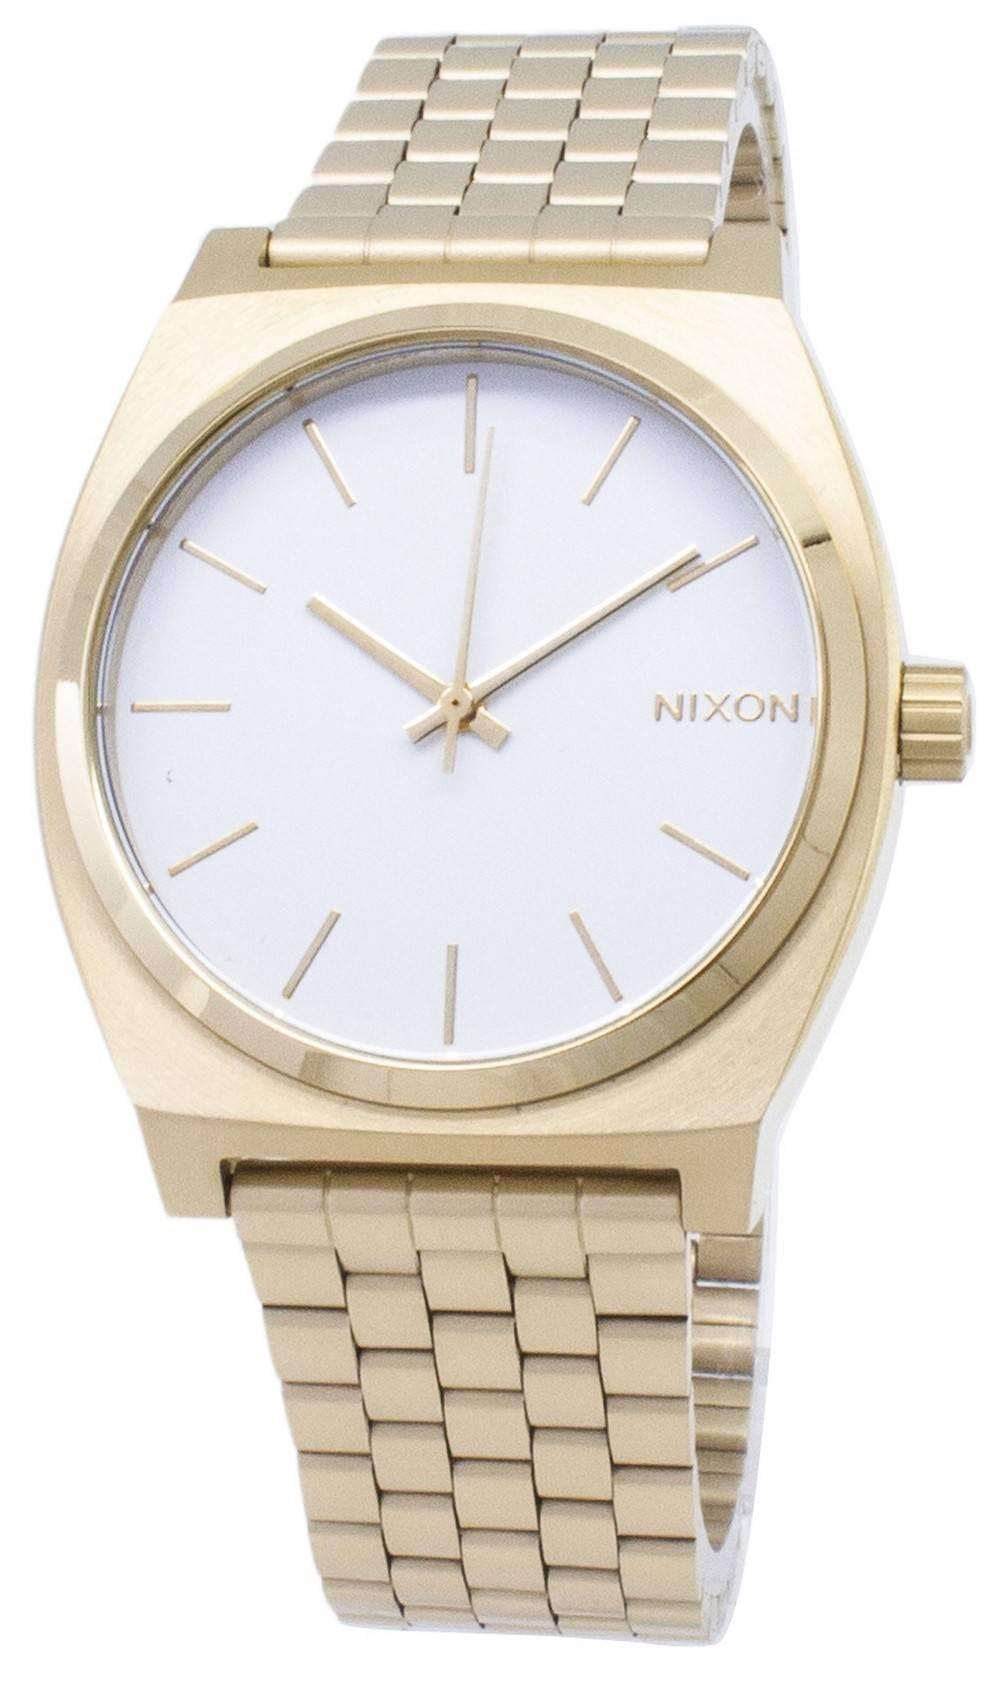 000b4dab2354 Detalles acerca de Nixon Time Teller A045-508-00 Analógico Cuarzo Reloj  para hombre- mostrar título original